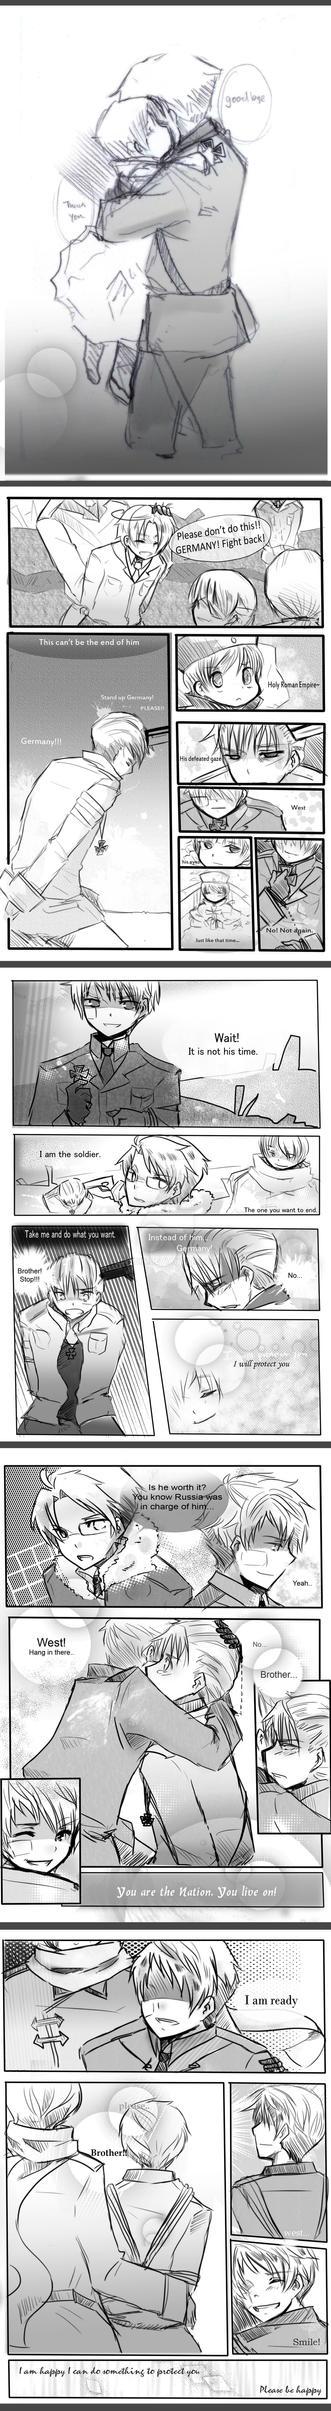 APH Snow bunny Part 1 by jinyjin